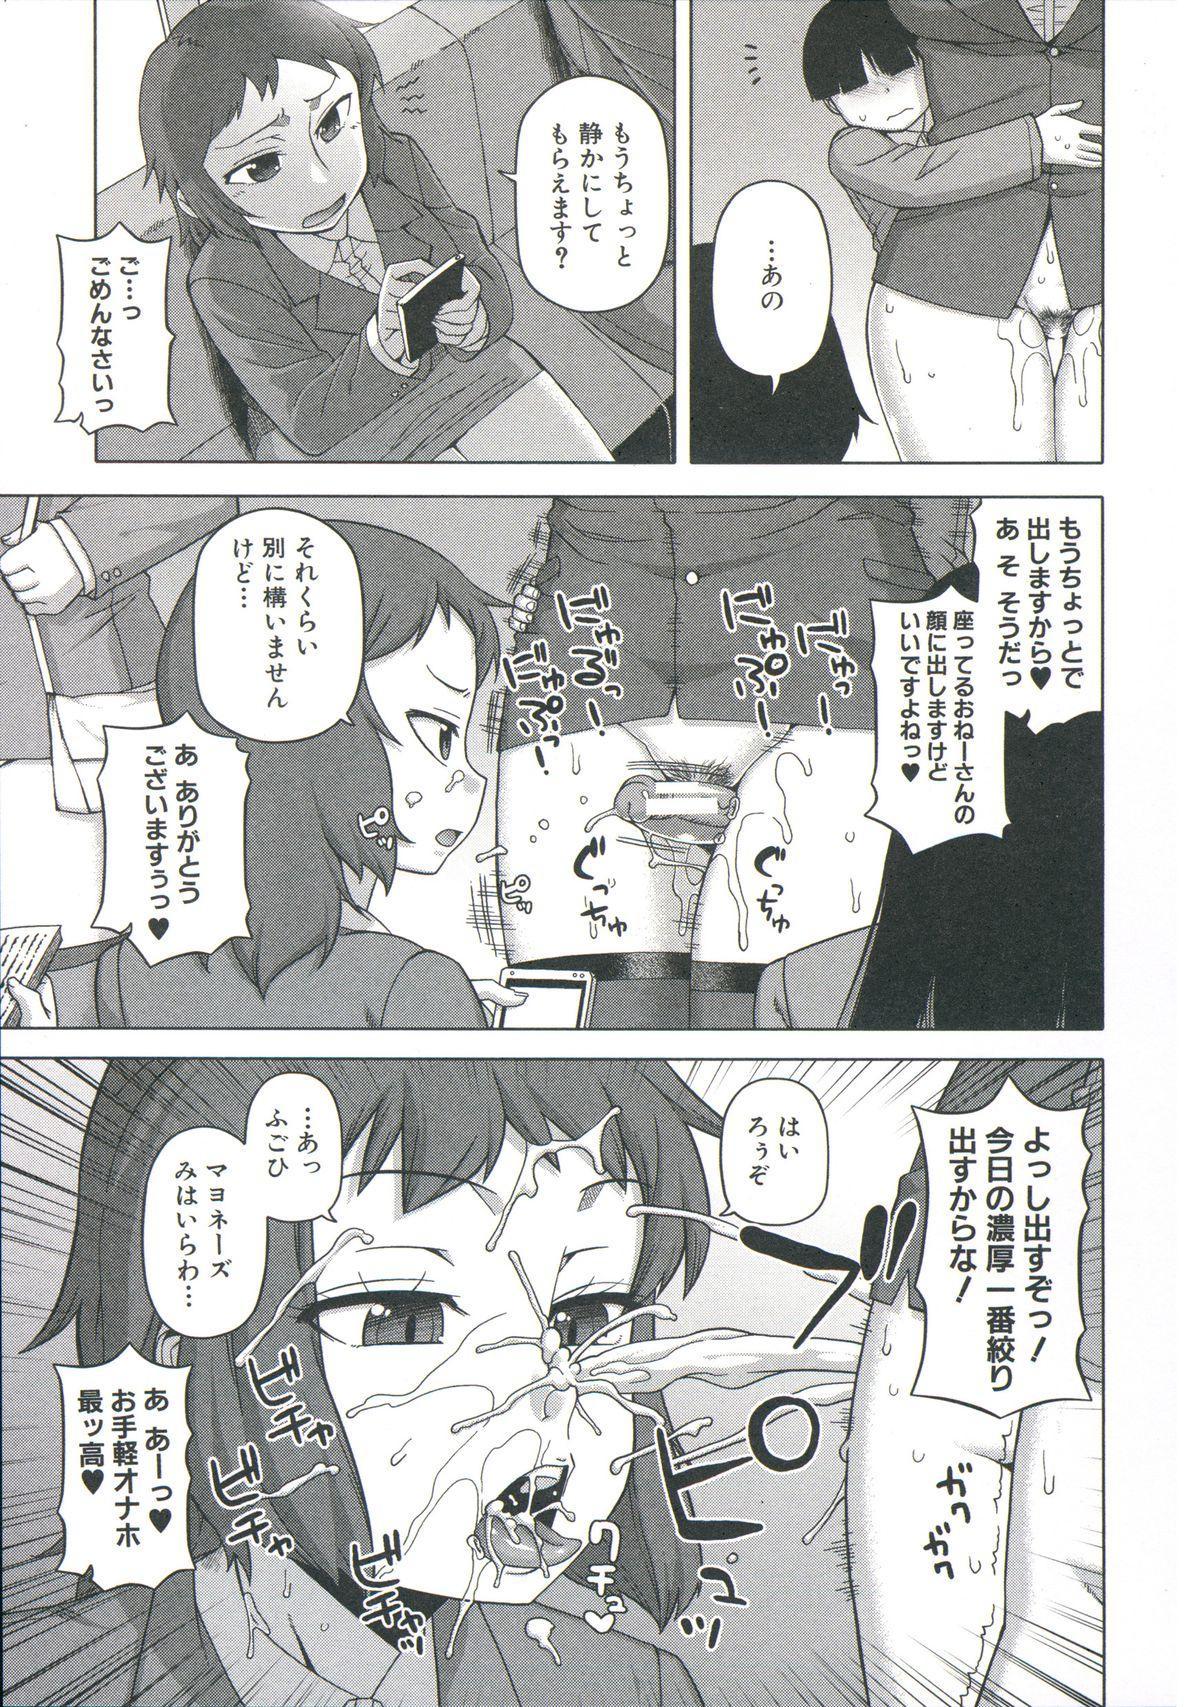 [Takatsu] Ou-sama Appli - King App 143